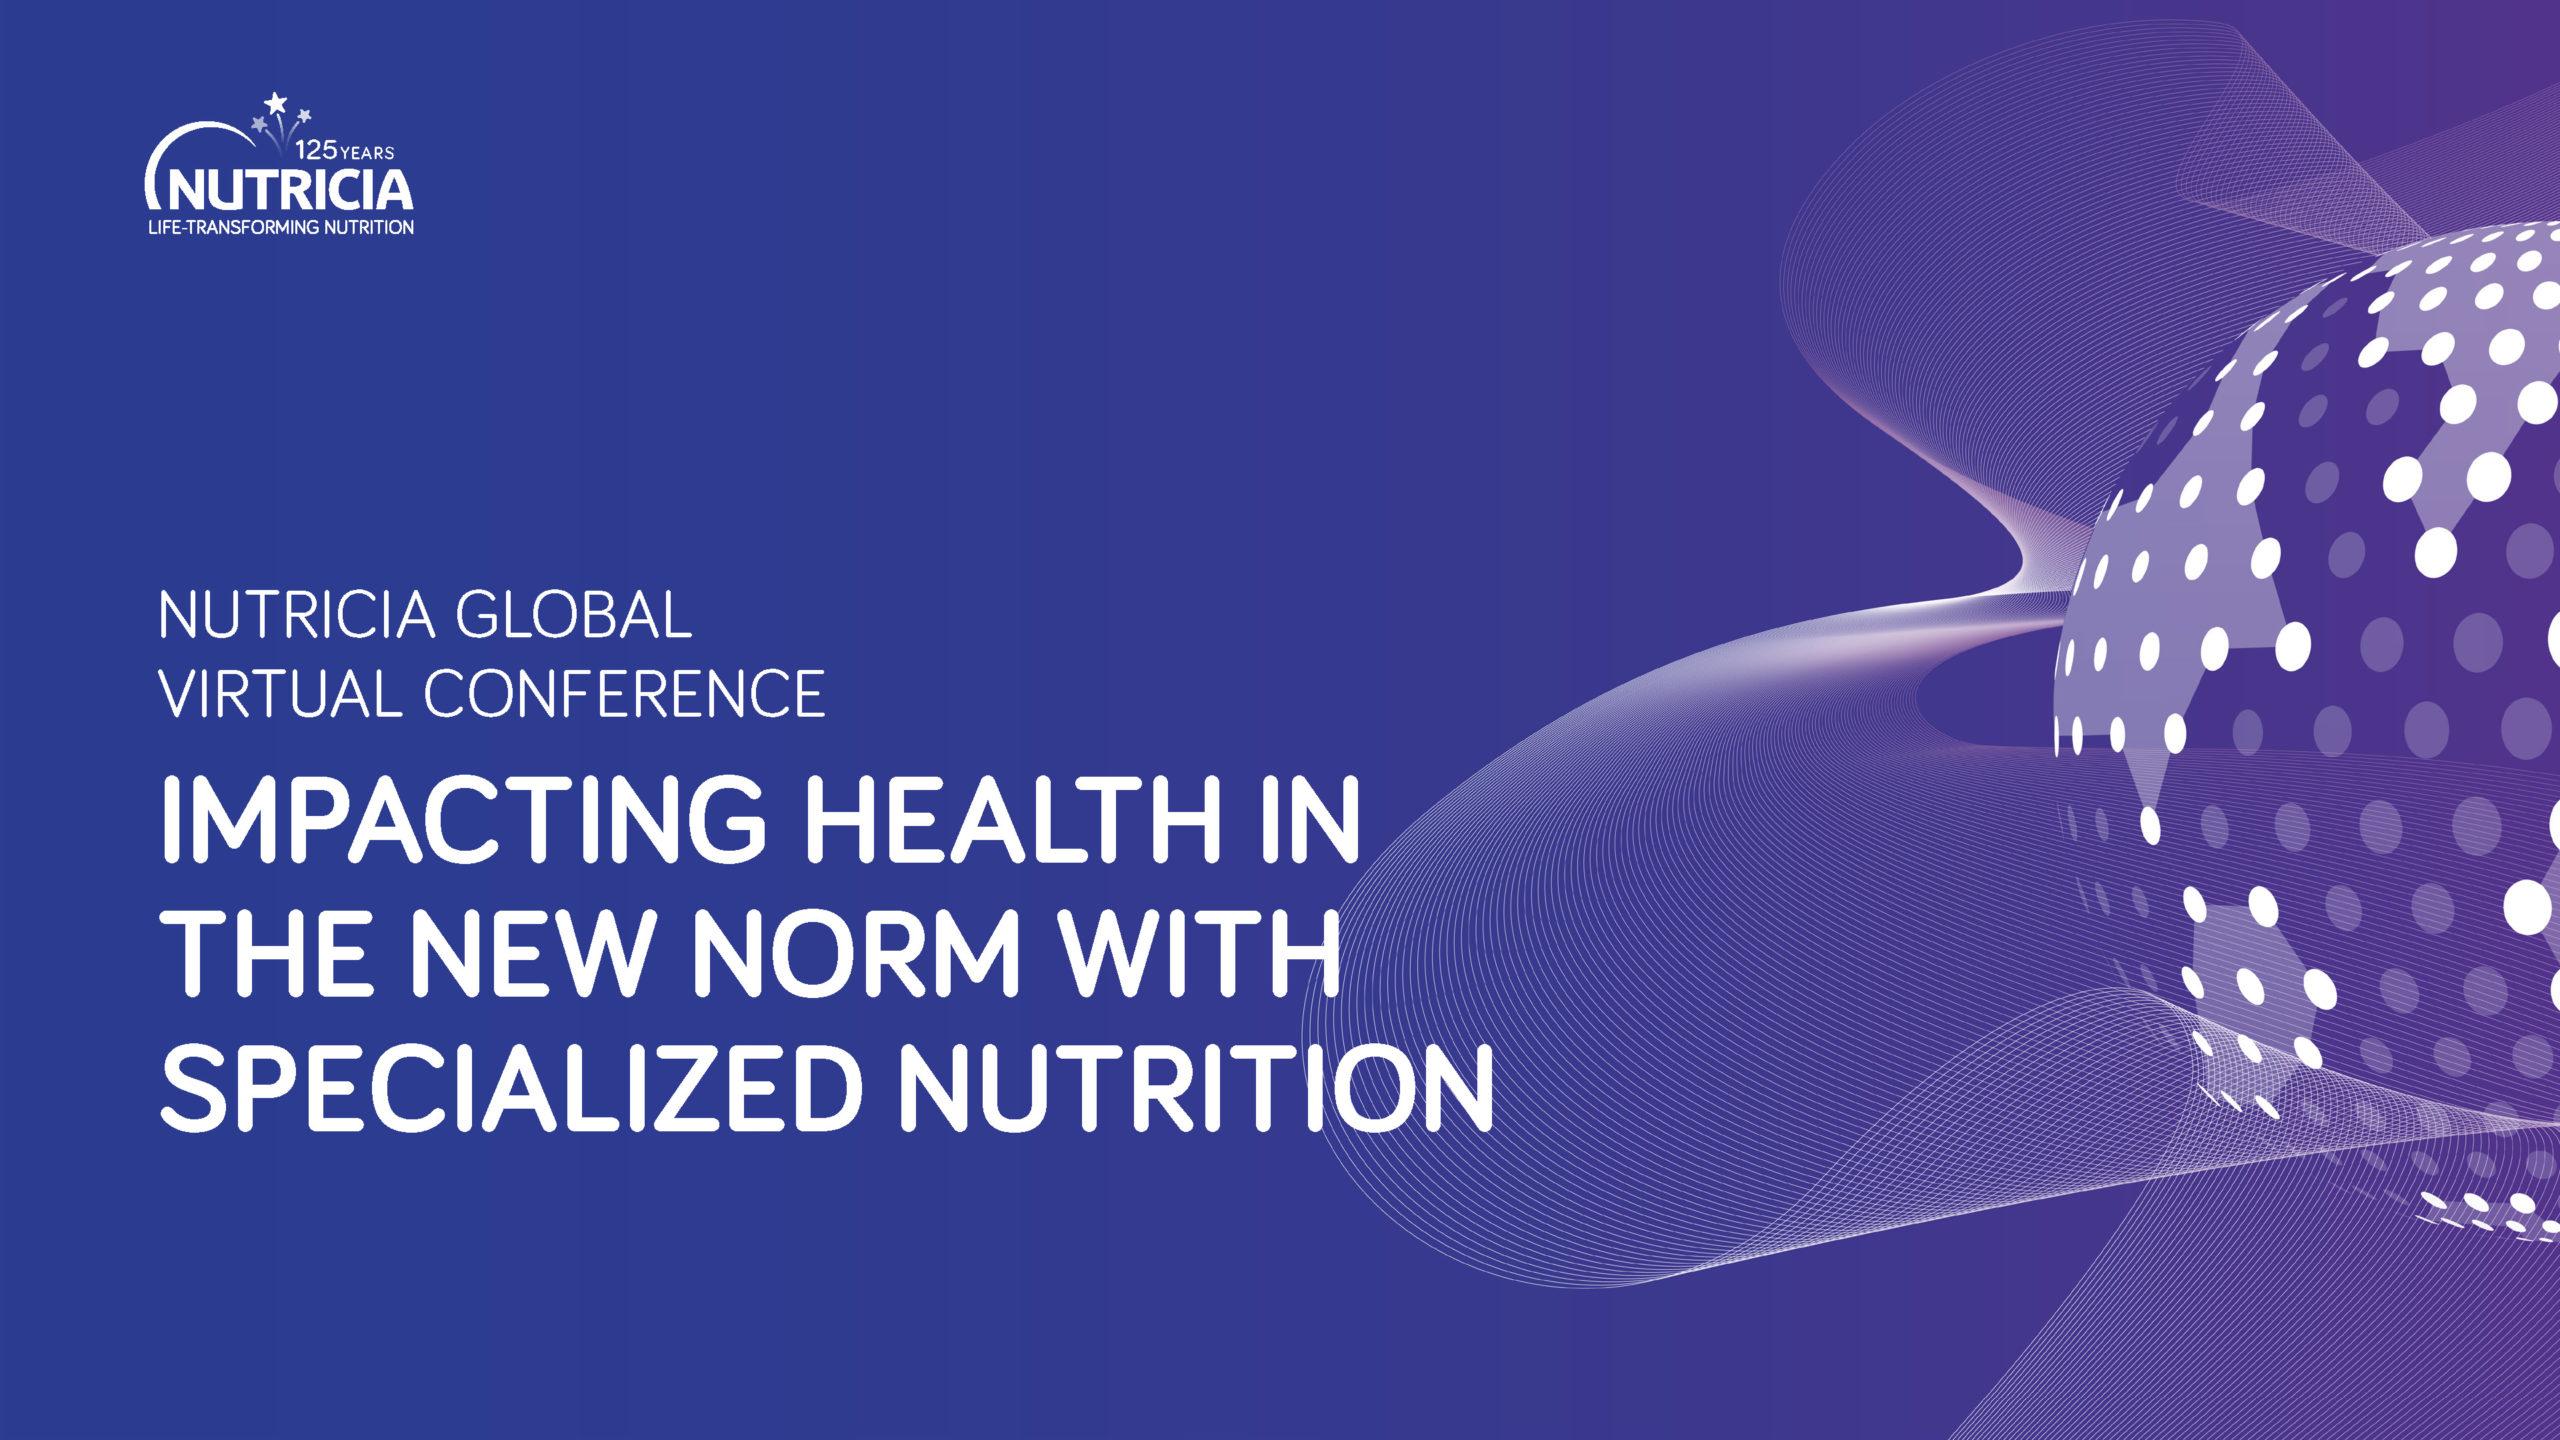 Nutricia Global Virtual Conference 21. mai 2021